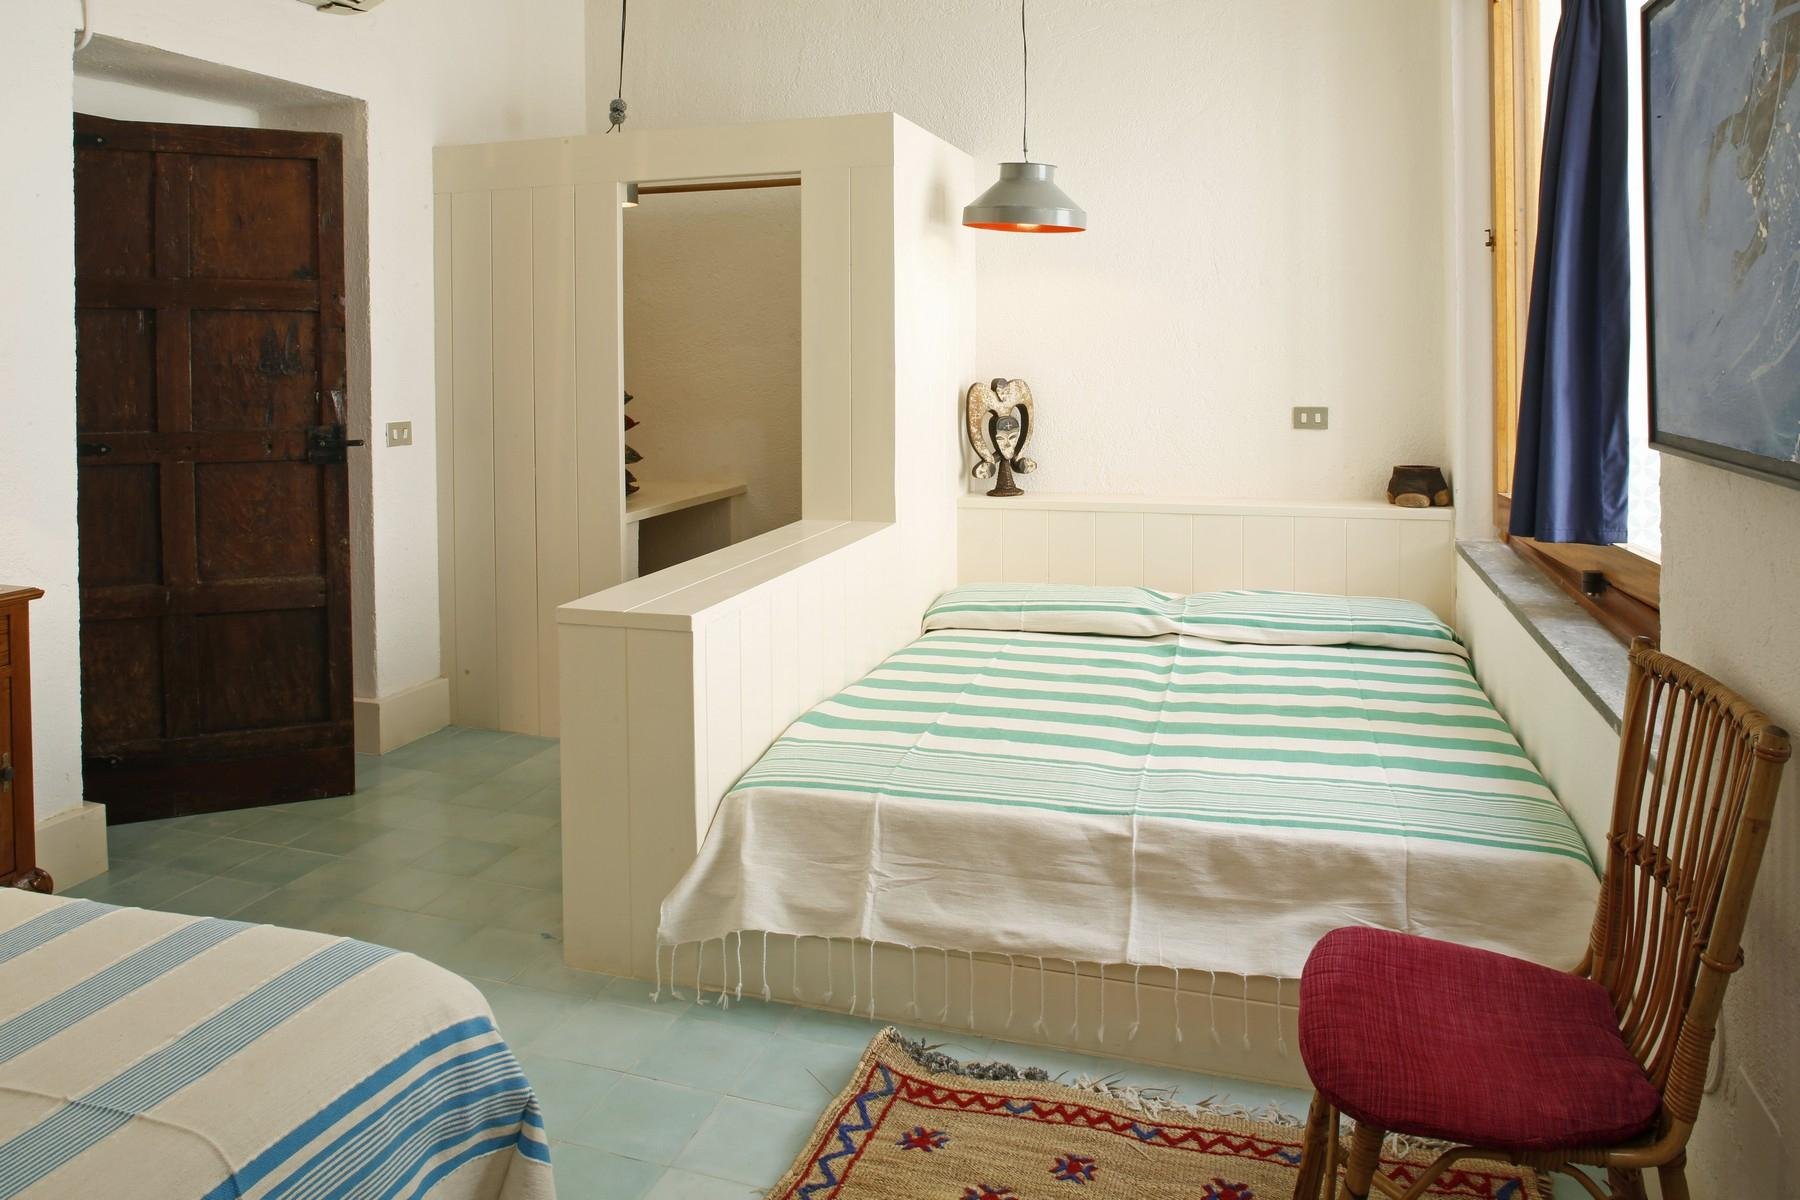 Villa pied dans l'eau in Costiera Amalfitana - 25